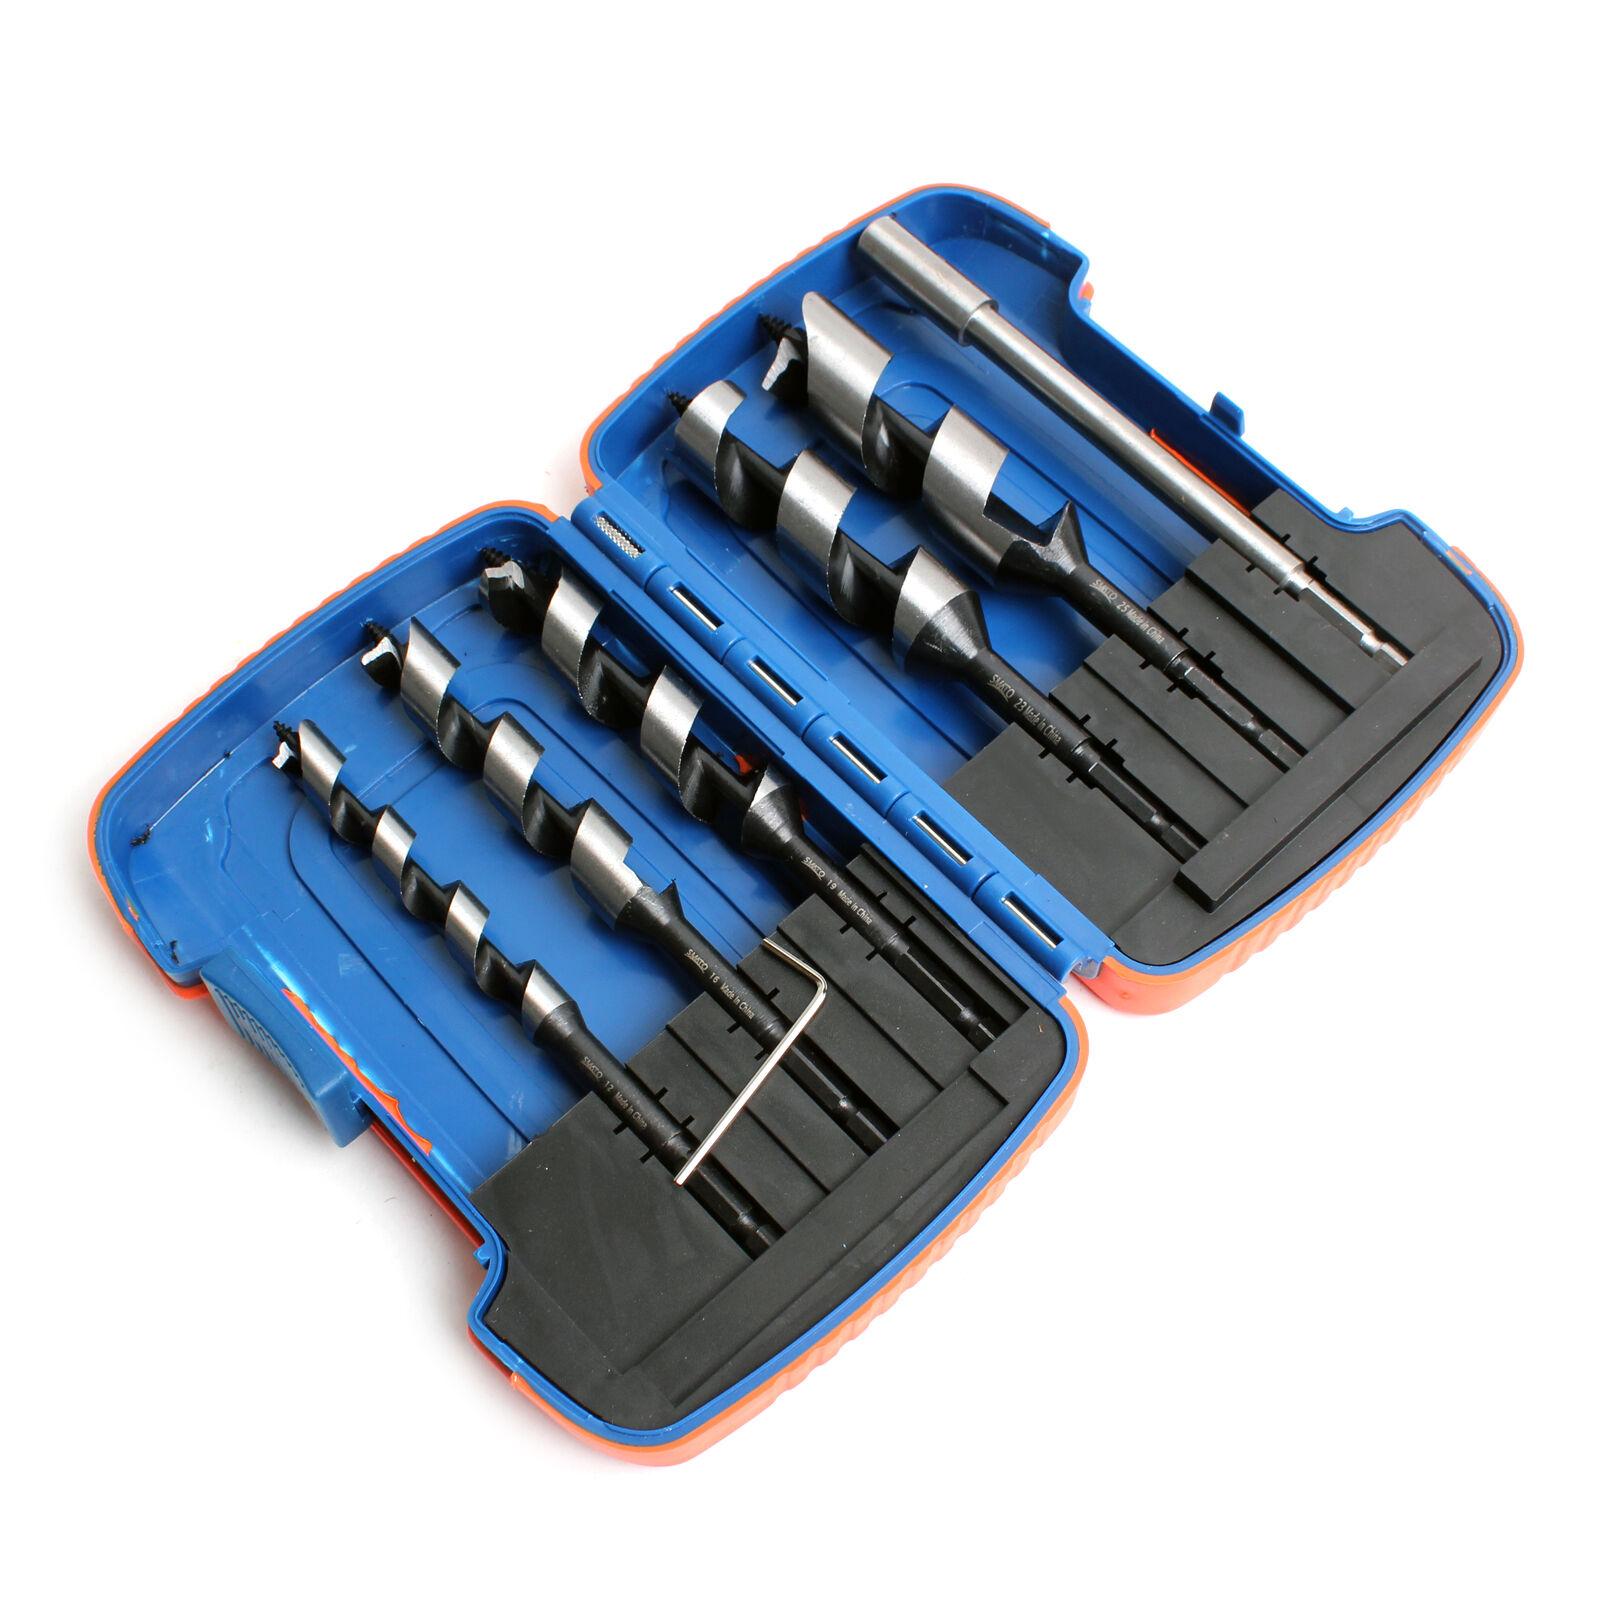 Woodworking Auger Drill Bit Set 12 mm 16 mm 19 mm 23 mm 25 mm Length 165mm